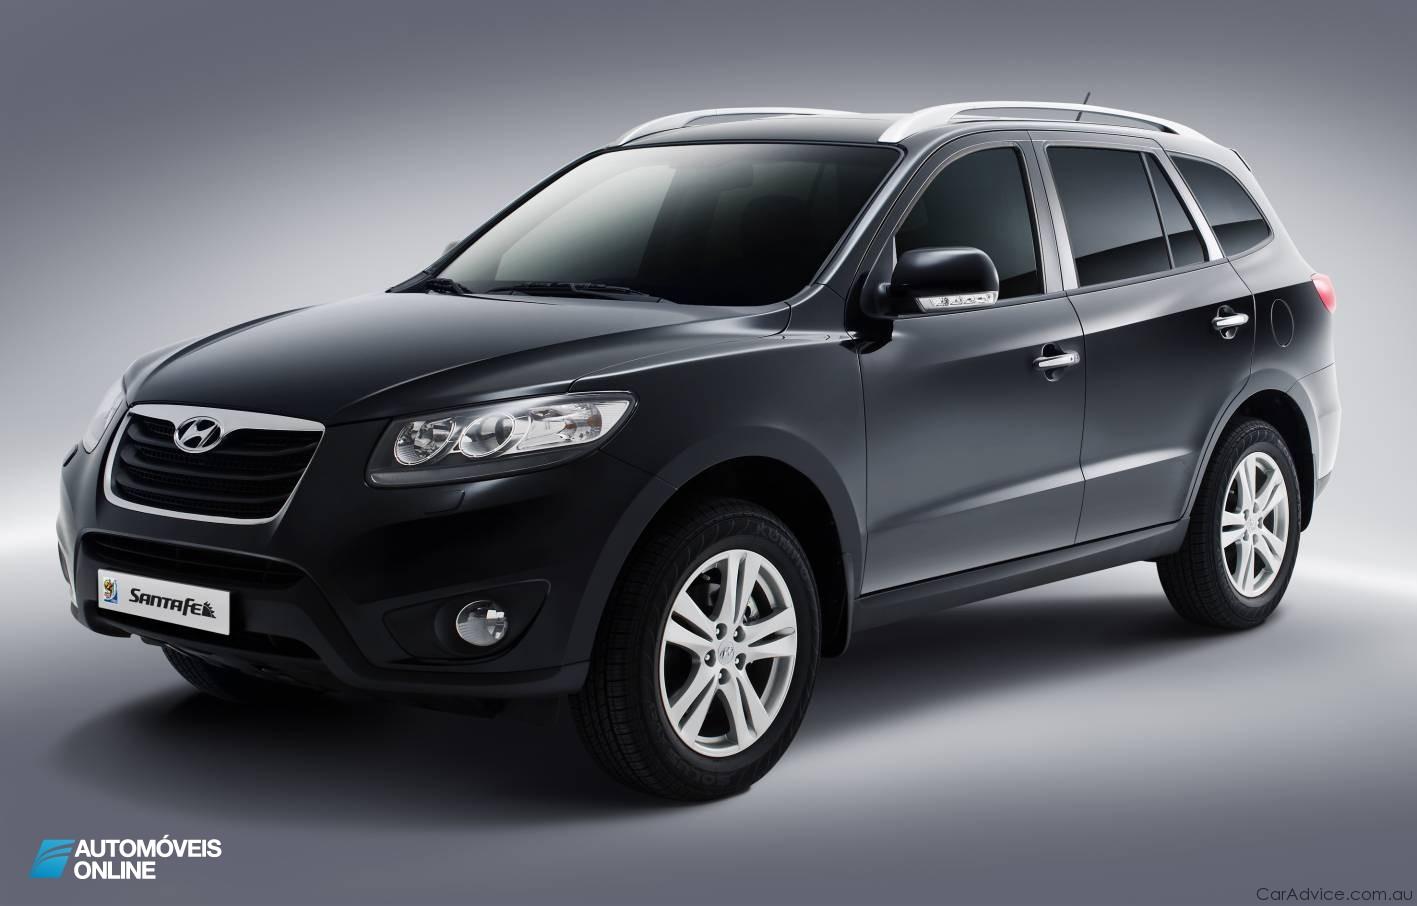 Vídeos! Novo e lindíssimo Hyundai Santa Fé